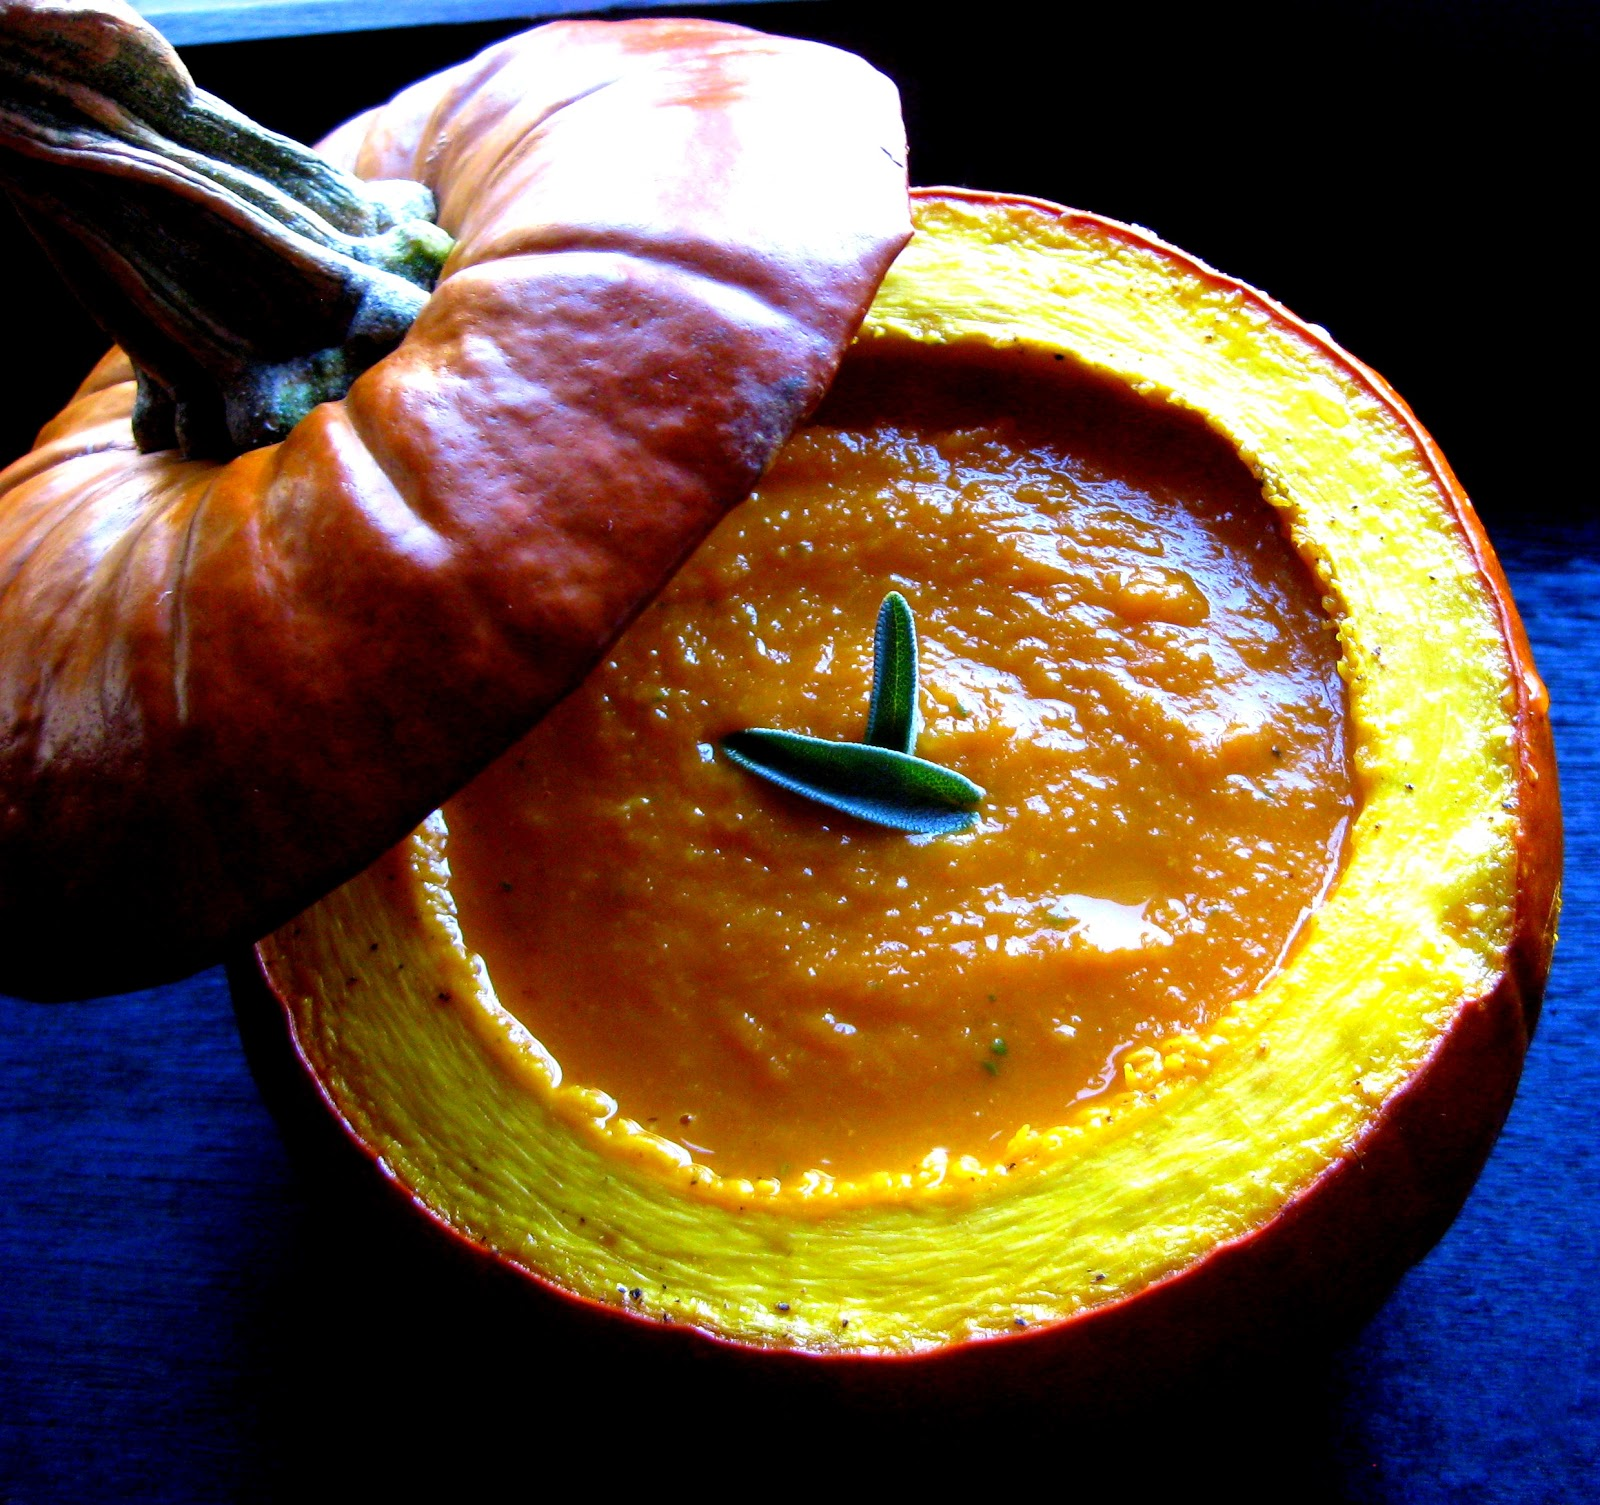 ... Vegetarian Food Blog: Pumpkin Soup Bowls and Roasted Pumpkin Seeds